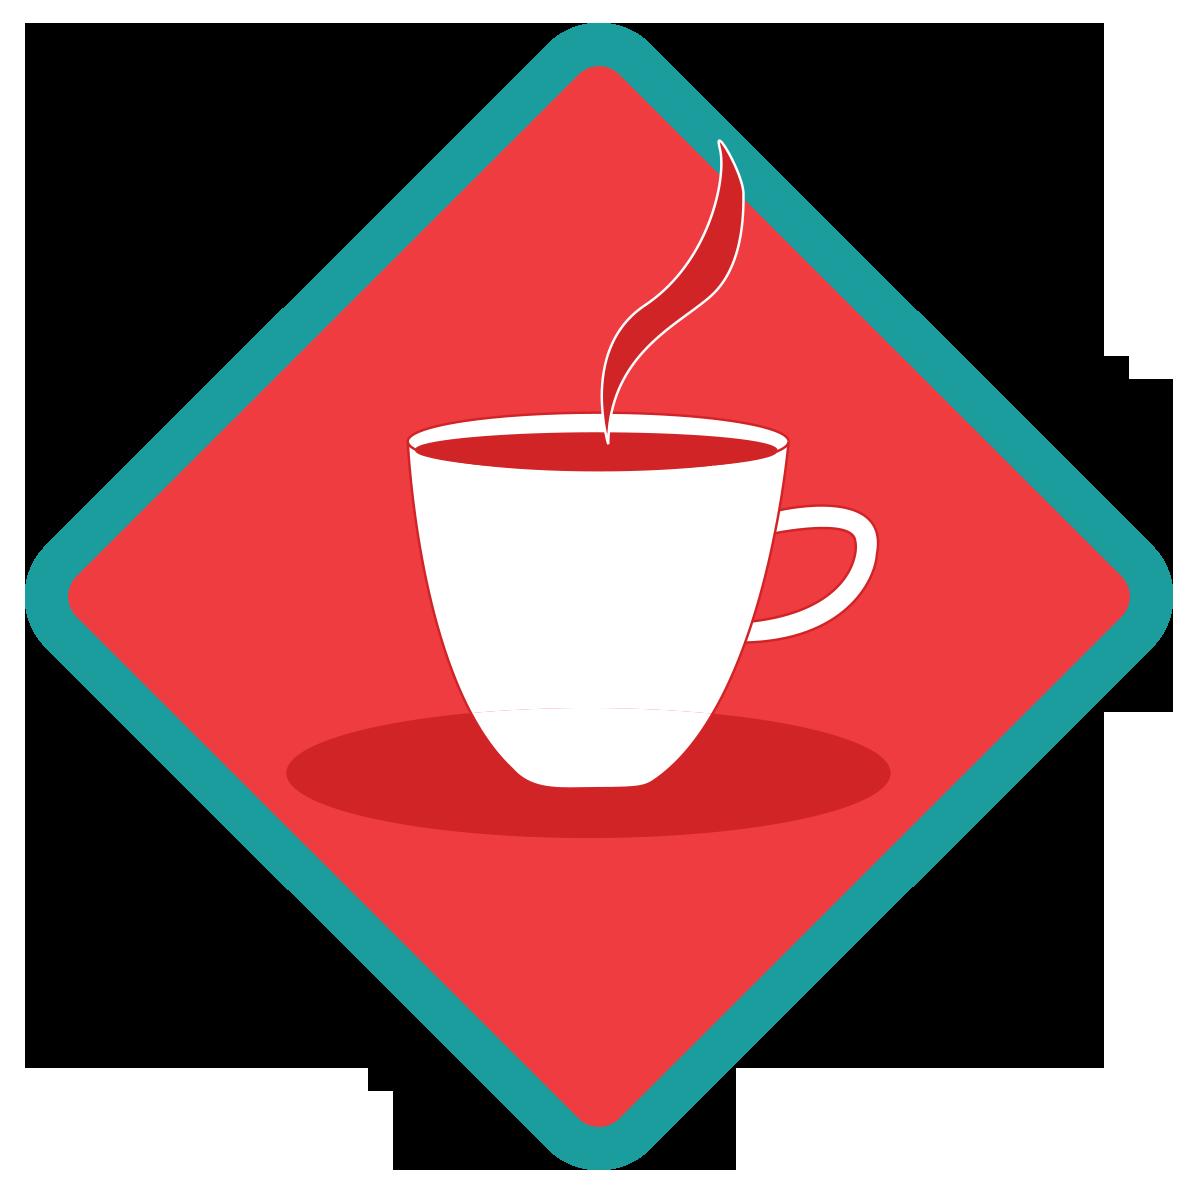 Relief benefits with caffeine. Headache clipart pain reliever